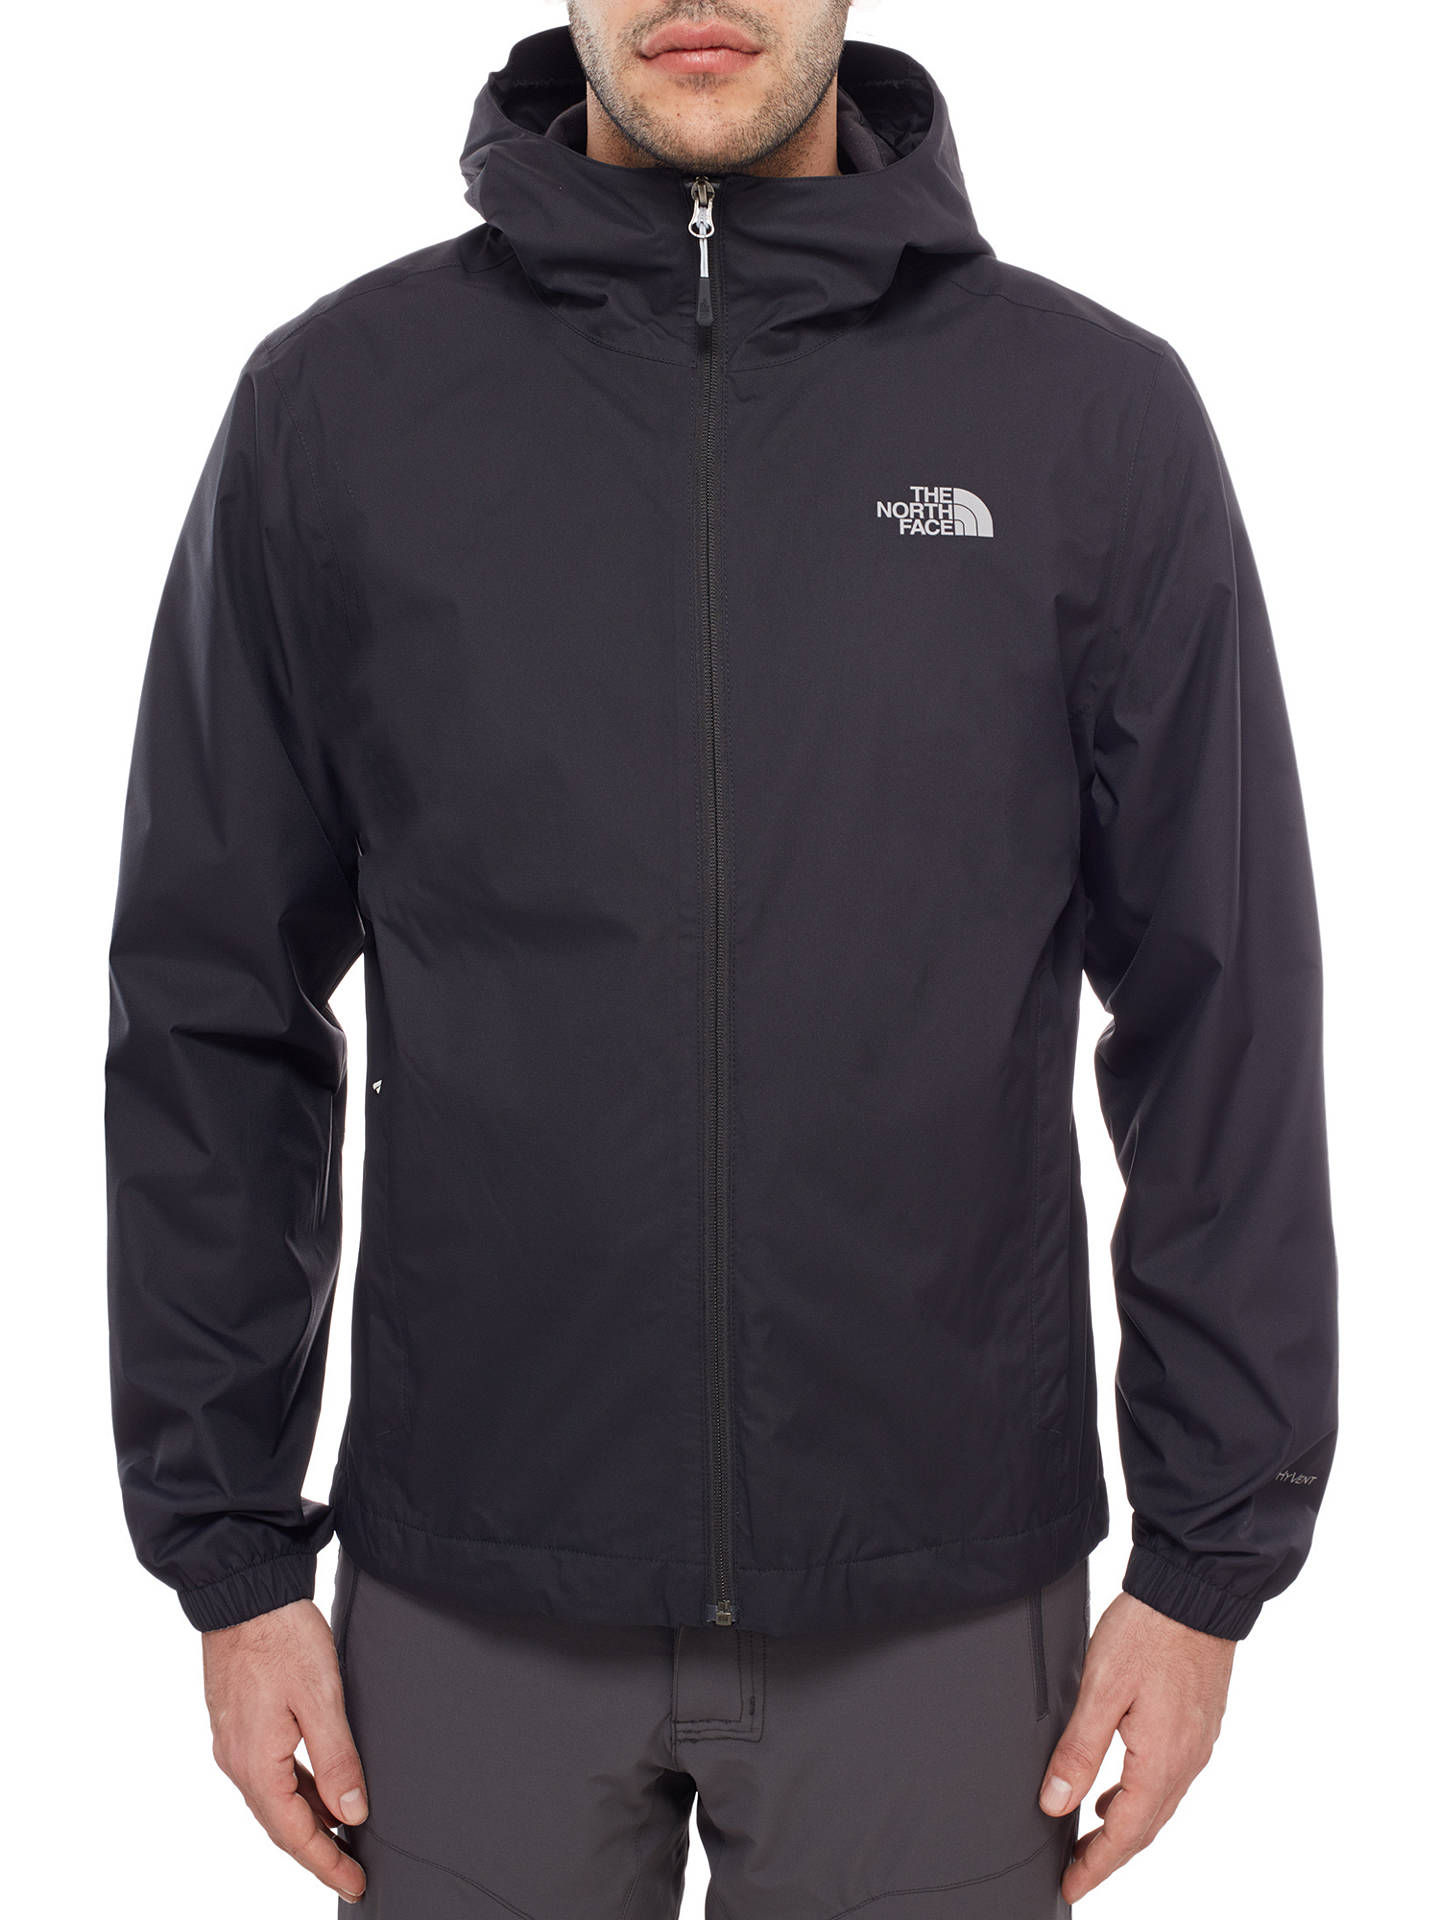 buy online 811c6 7dcae The North Face Quest Waterproof Men's Jacket, Black